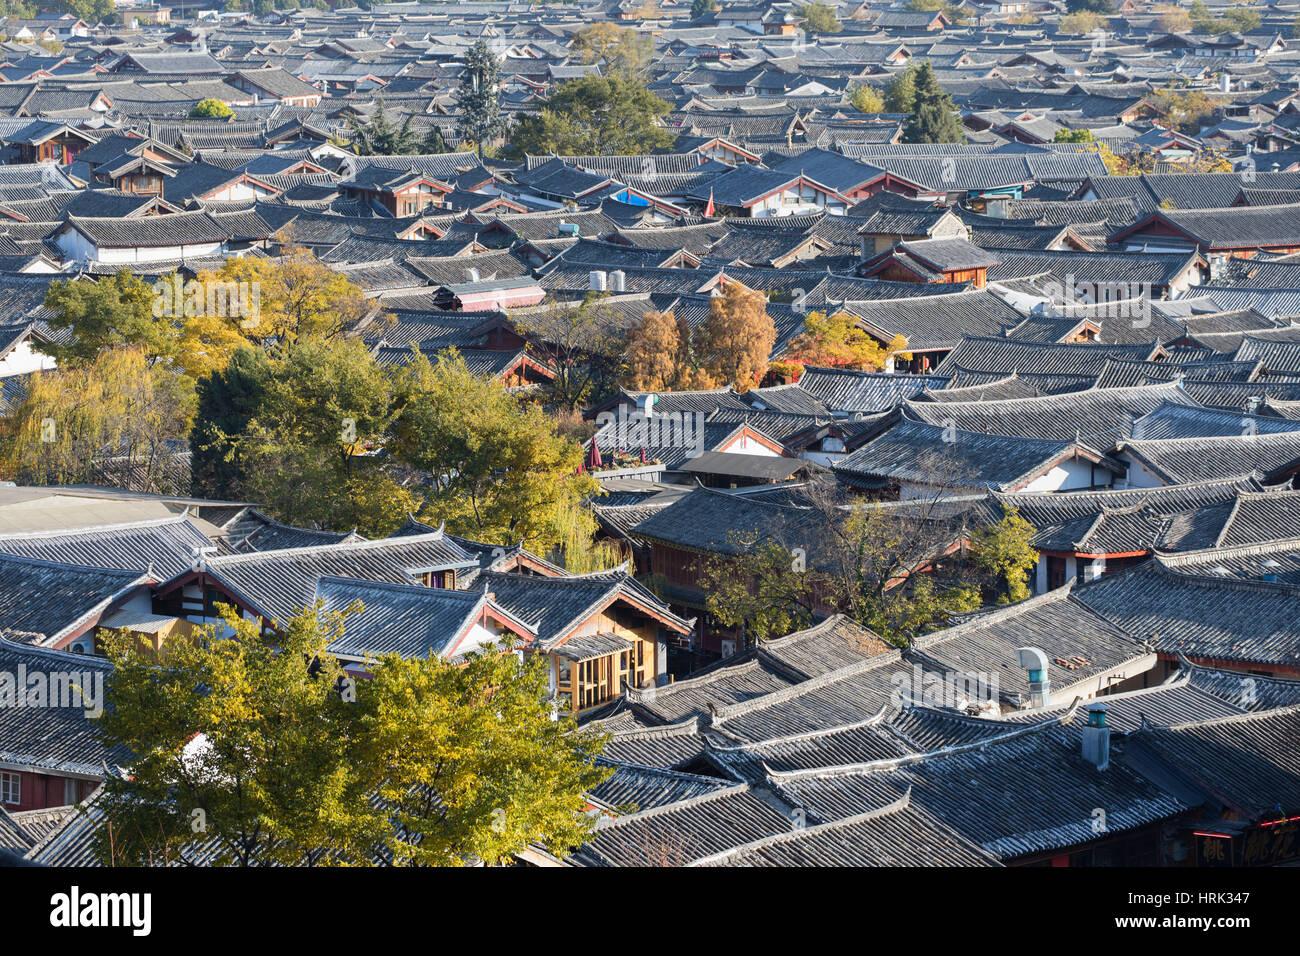 View of Lijiang (UNESCO World Heritage Site), Yunnan, China - Stock Image